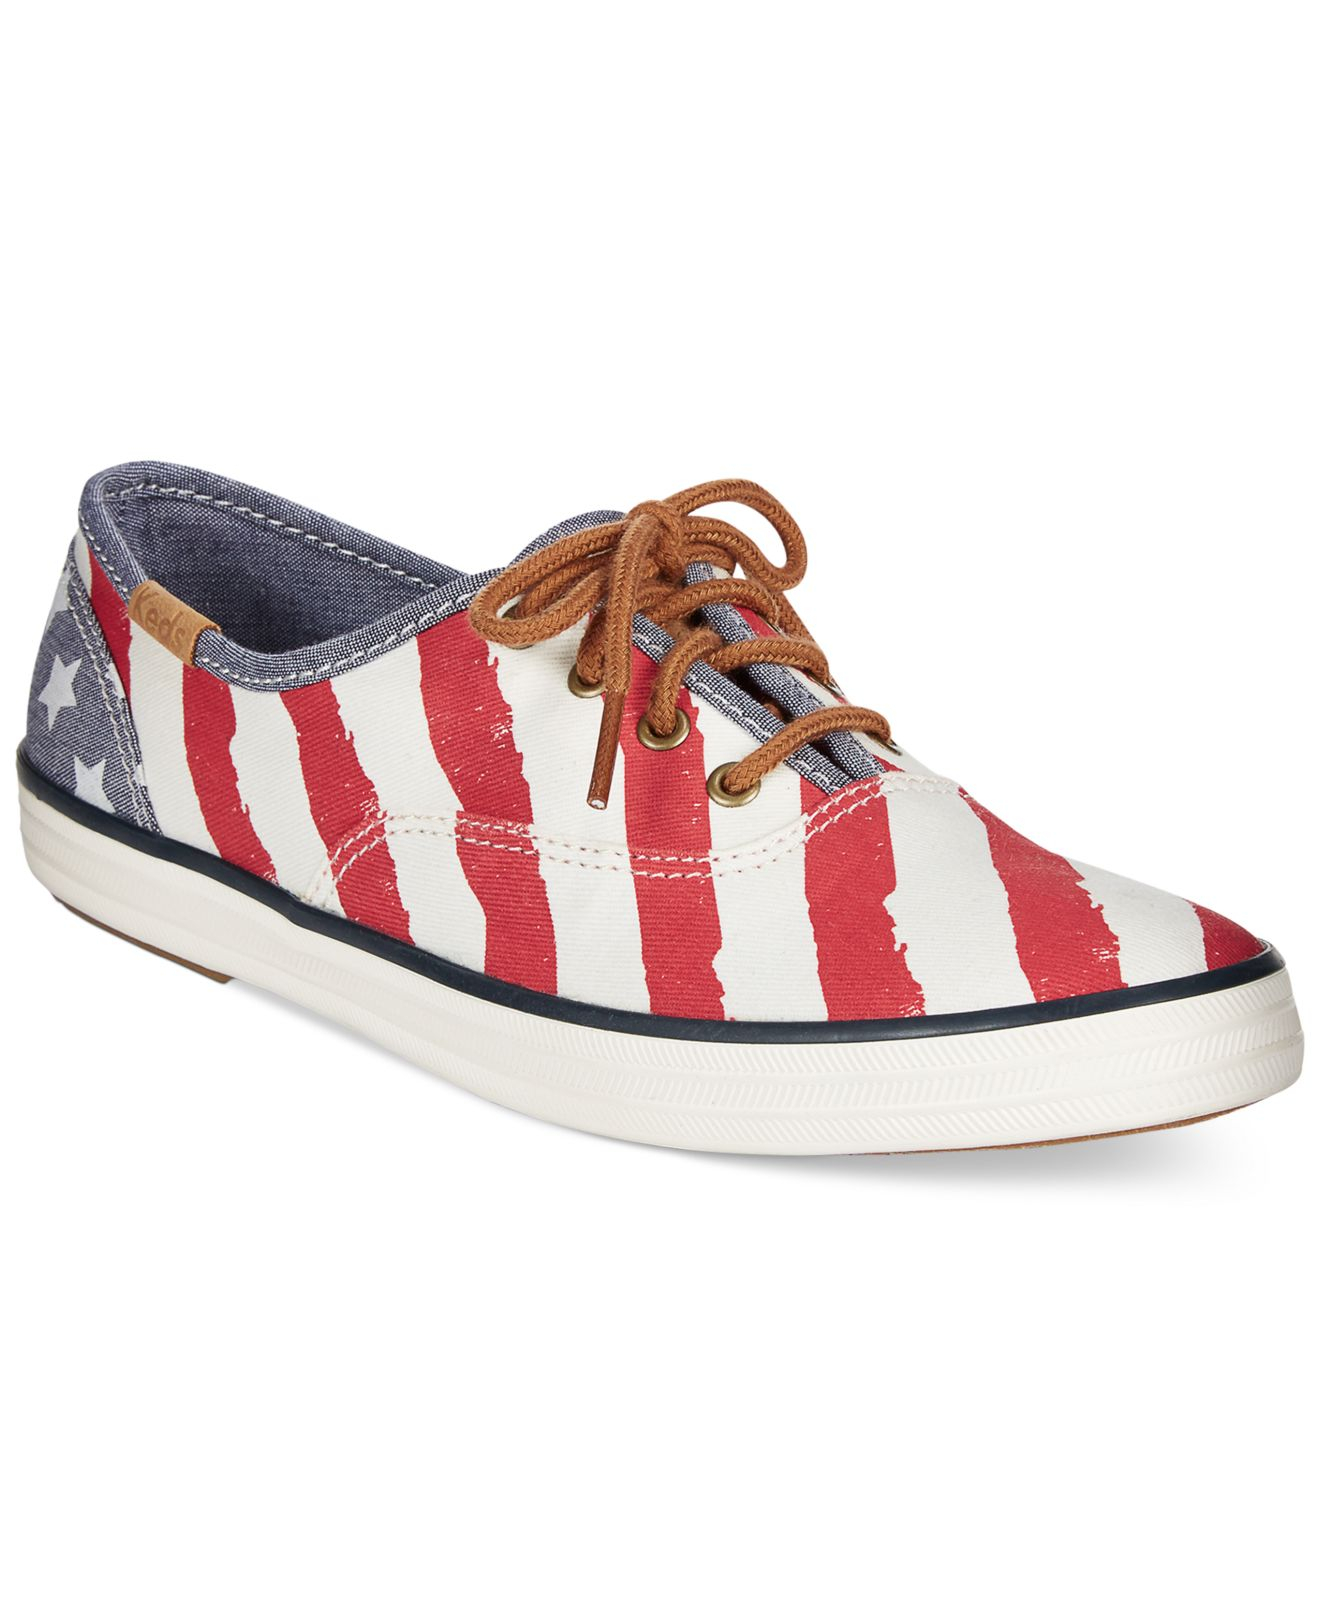 b86feffa5eea Lyst - Keds Women s Champion Patriotic Sneakers in Red